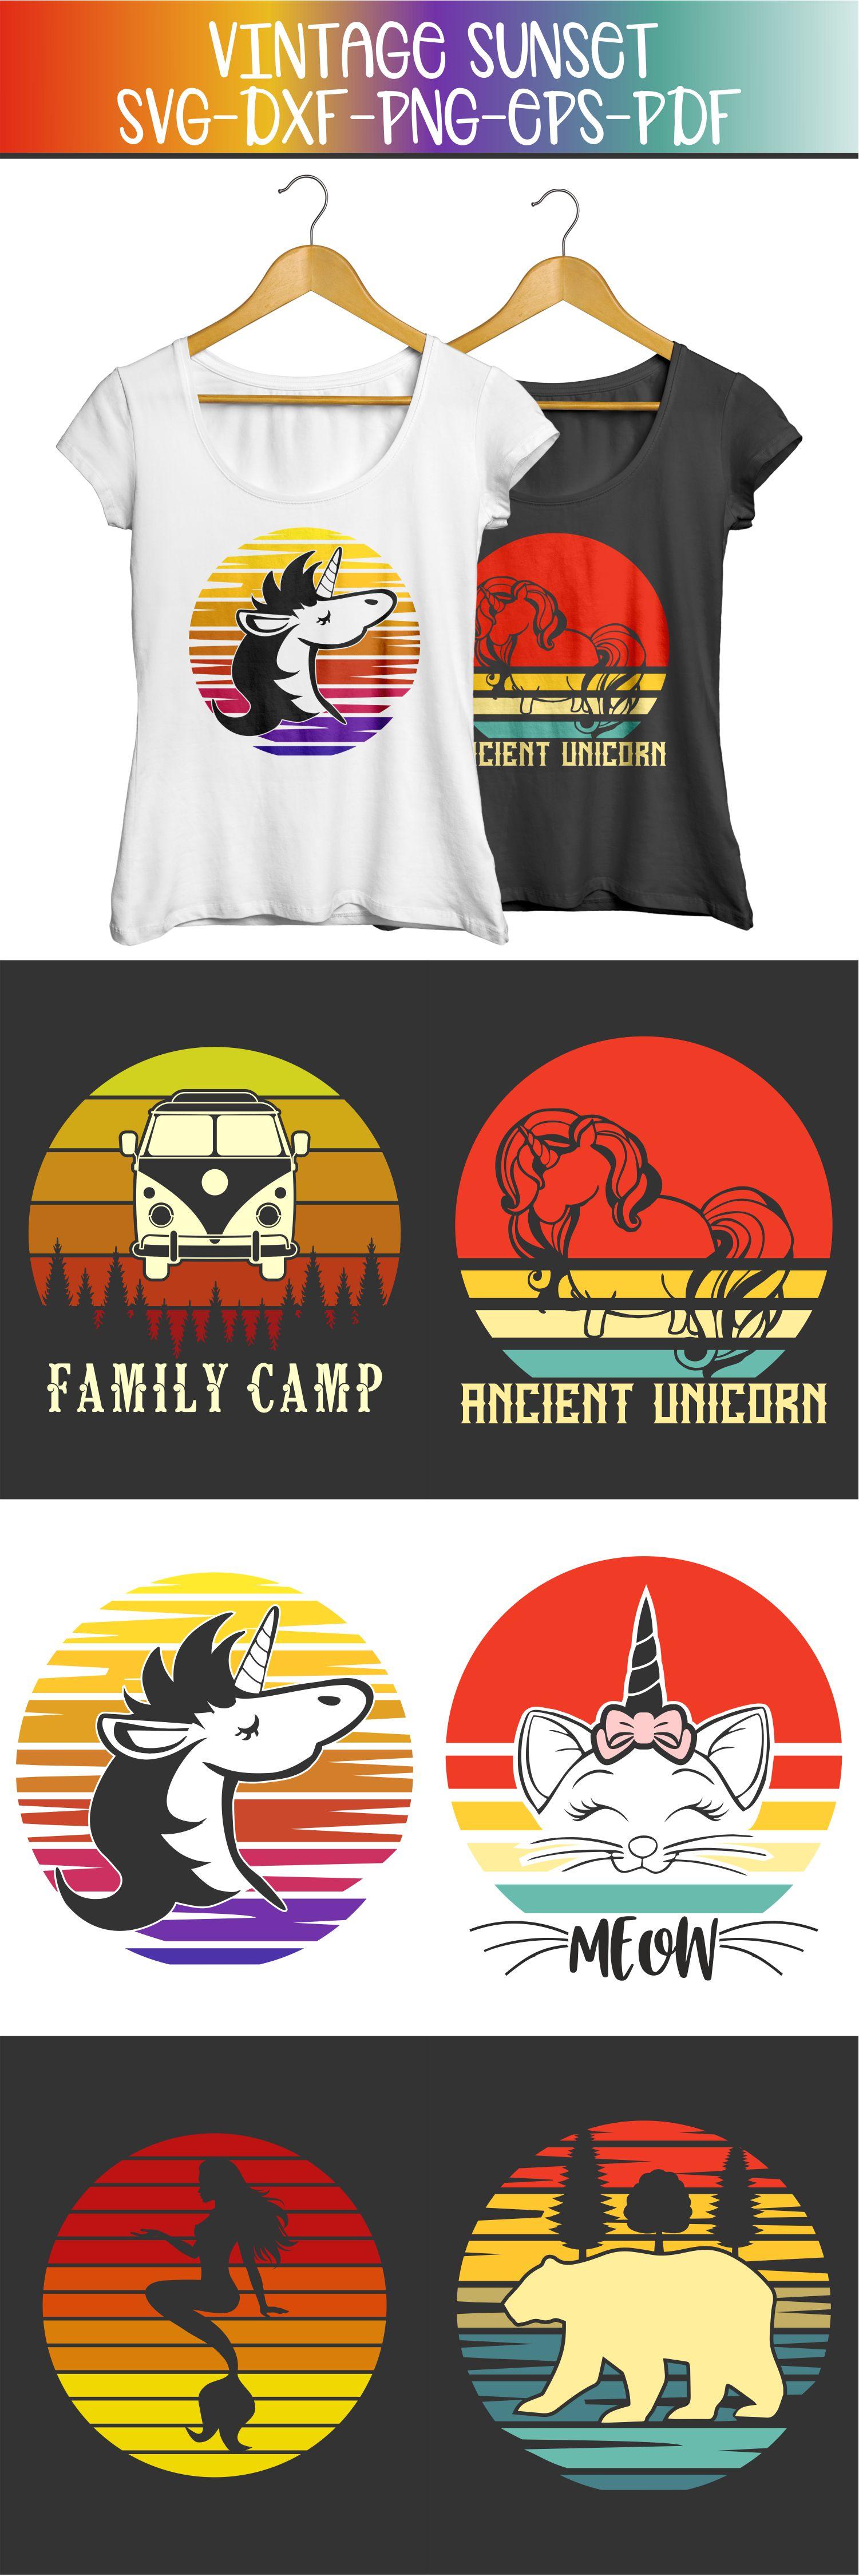 vintage sunset retro t-shirt designs, unicorn cat bear svg example image 4